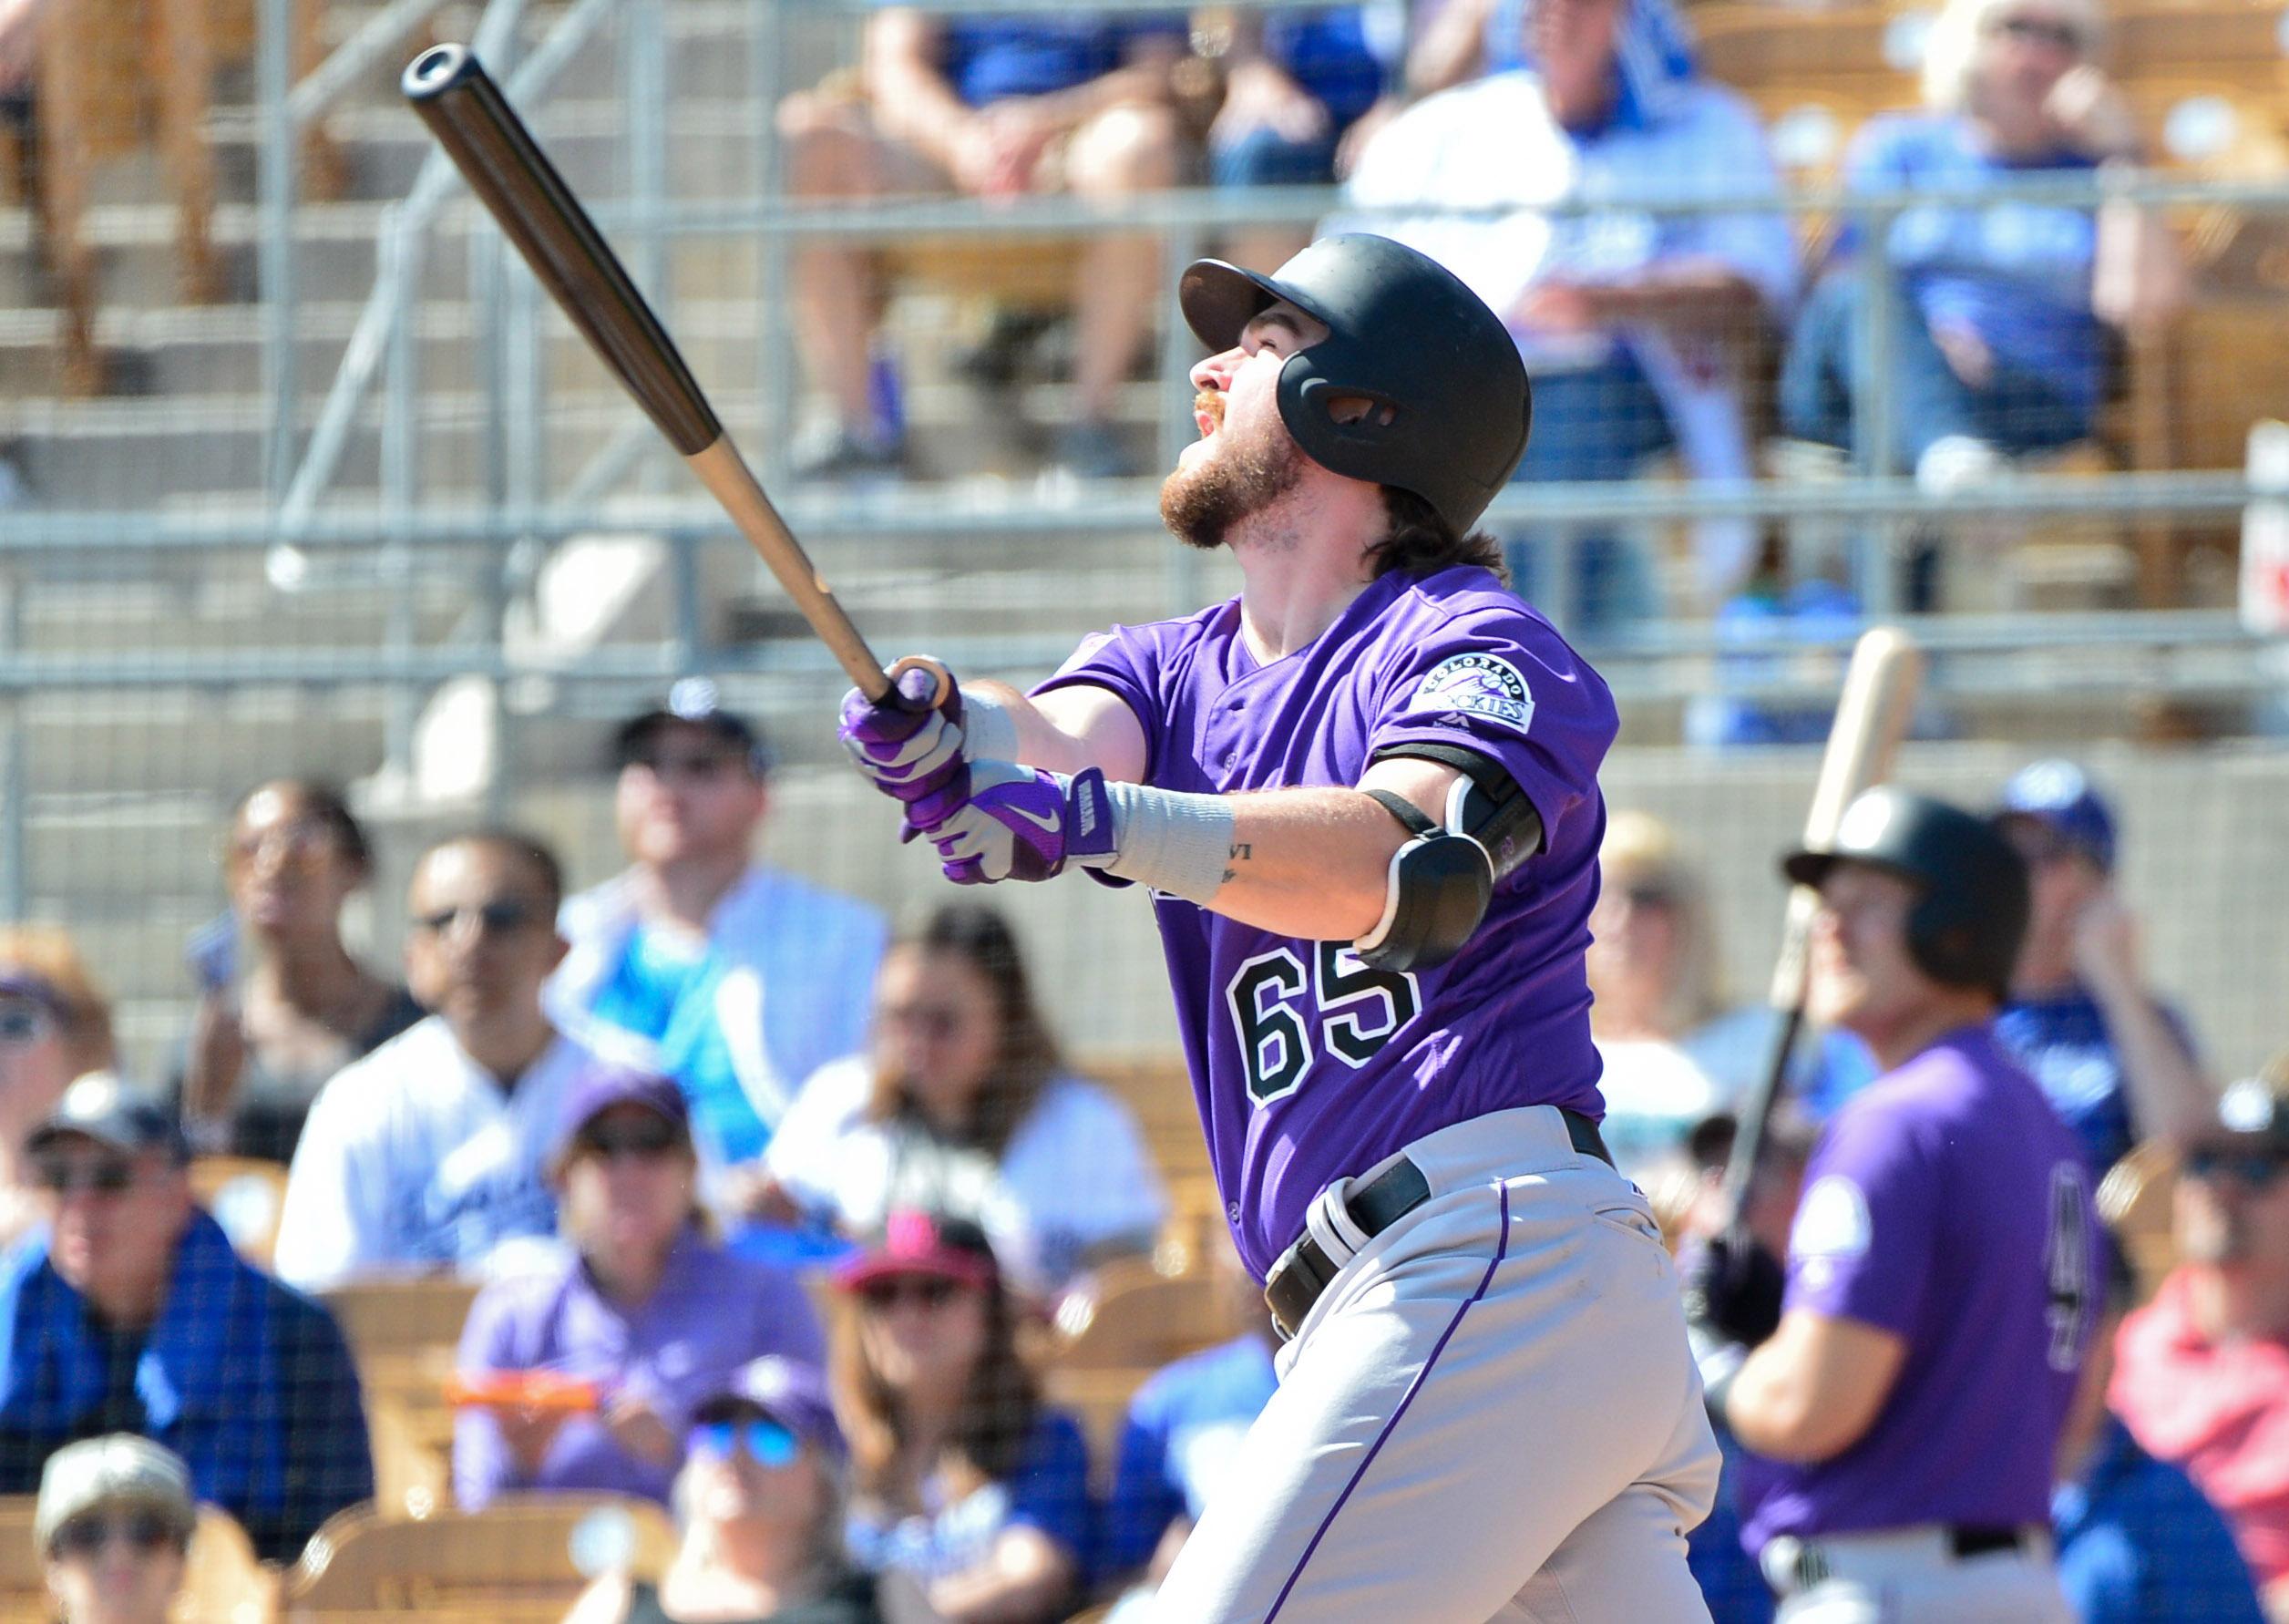 MLB: Spring Training-Colorado Rockies at Los Angeles Dodgers